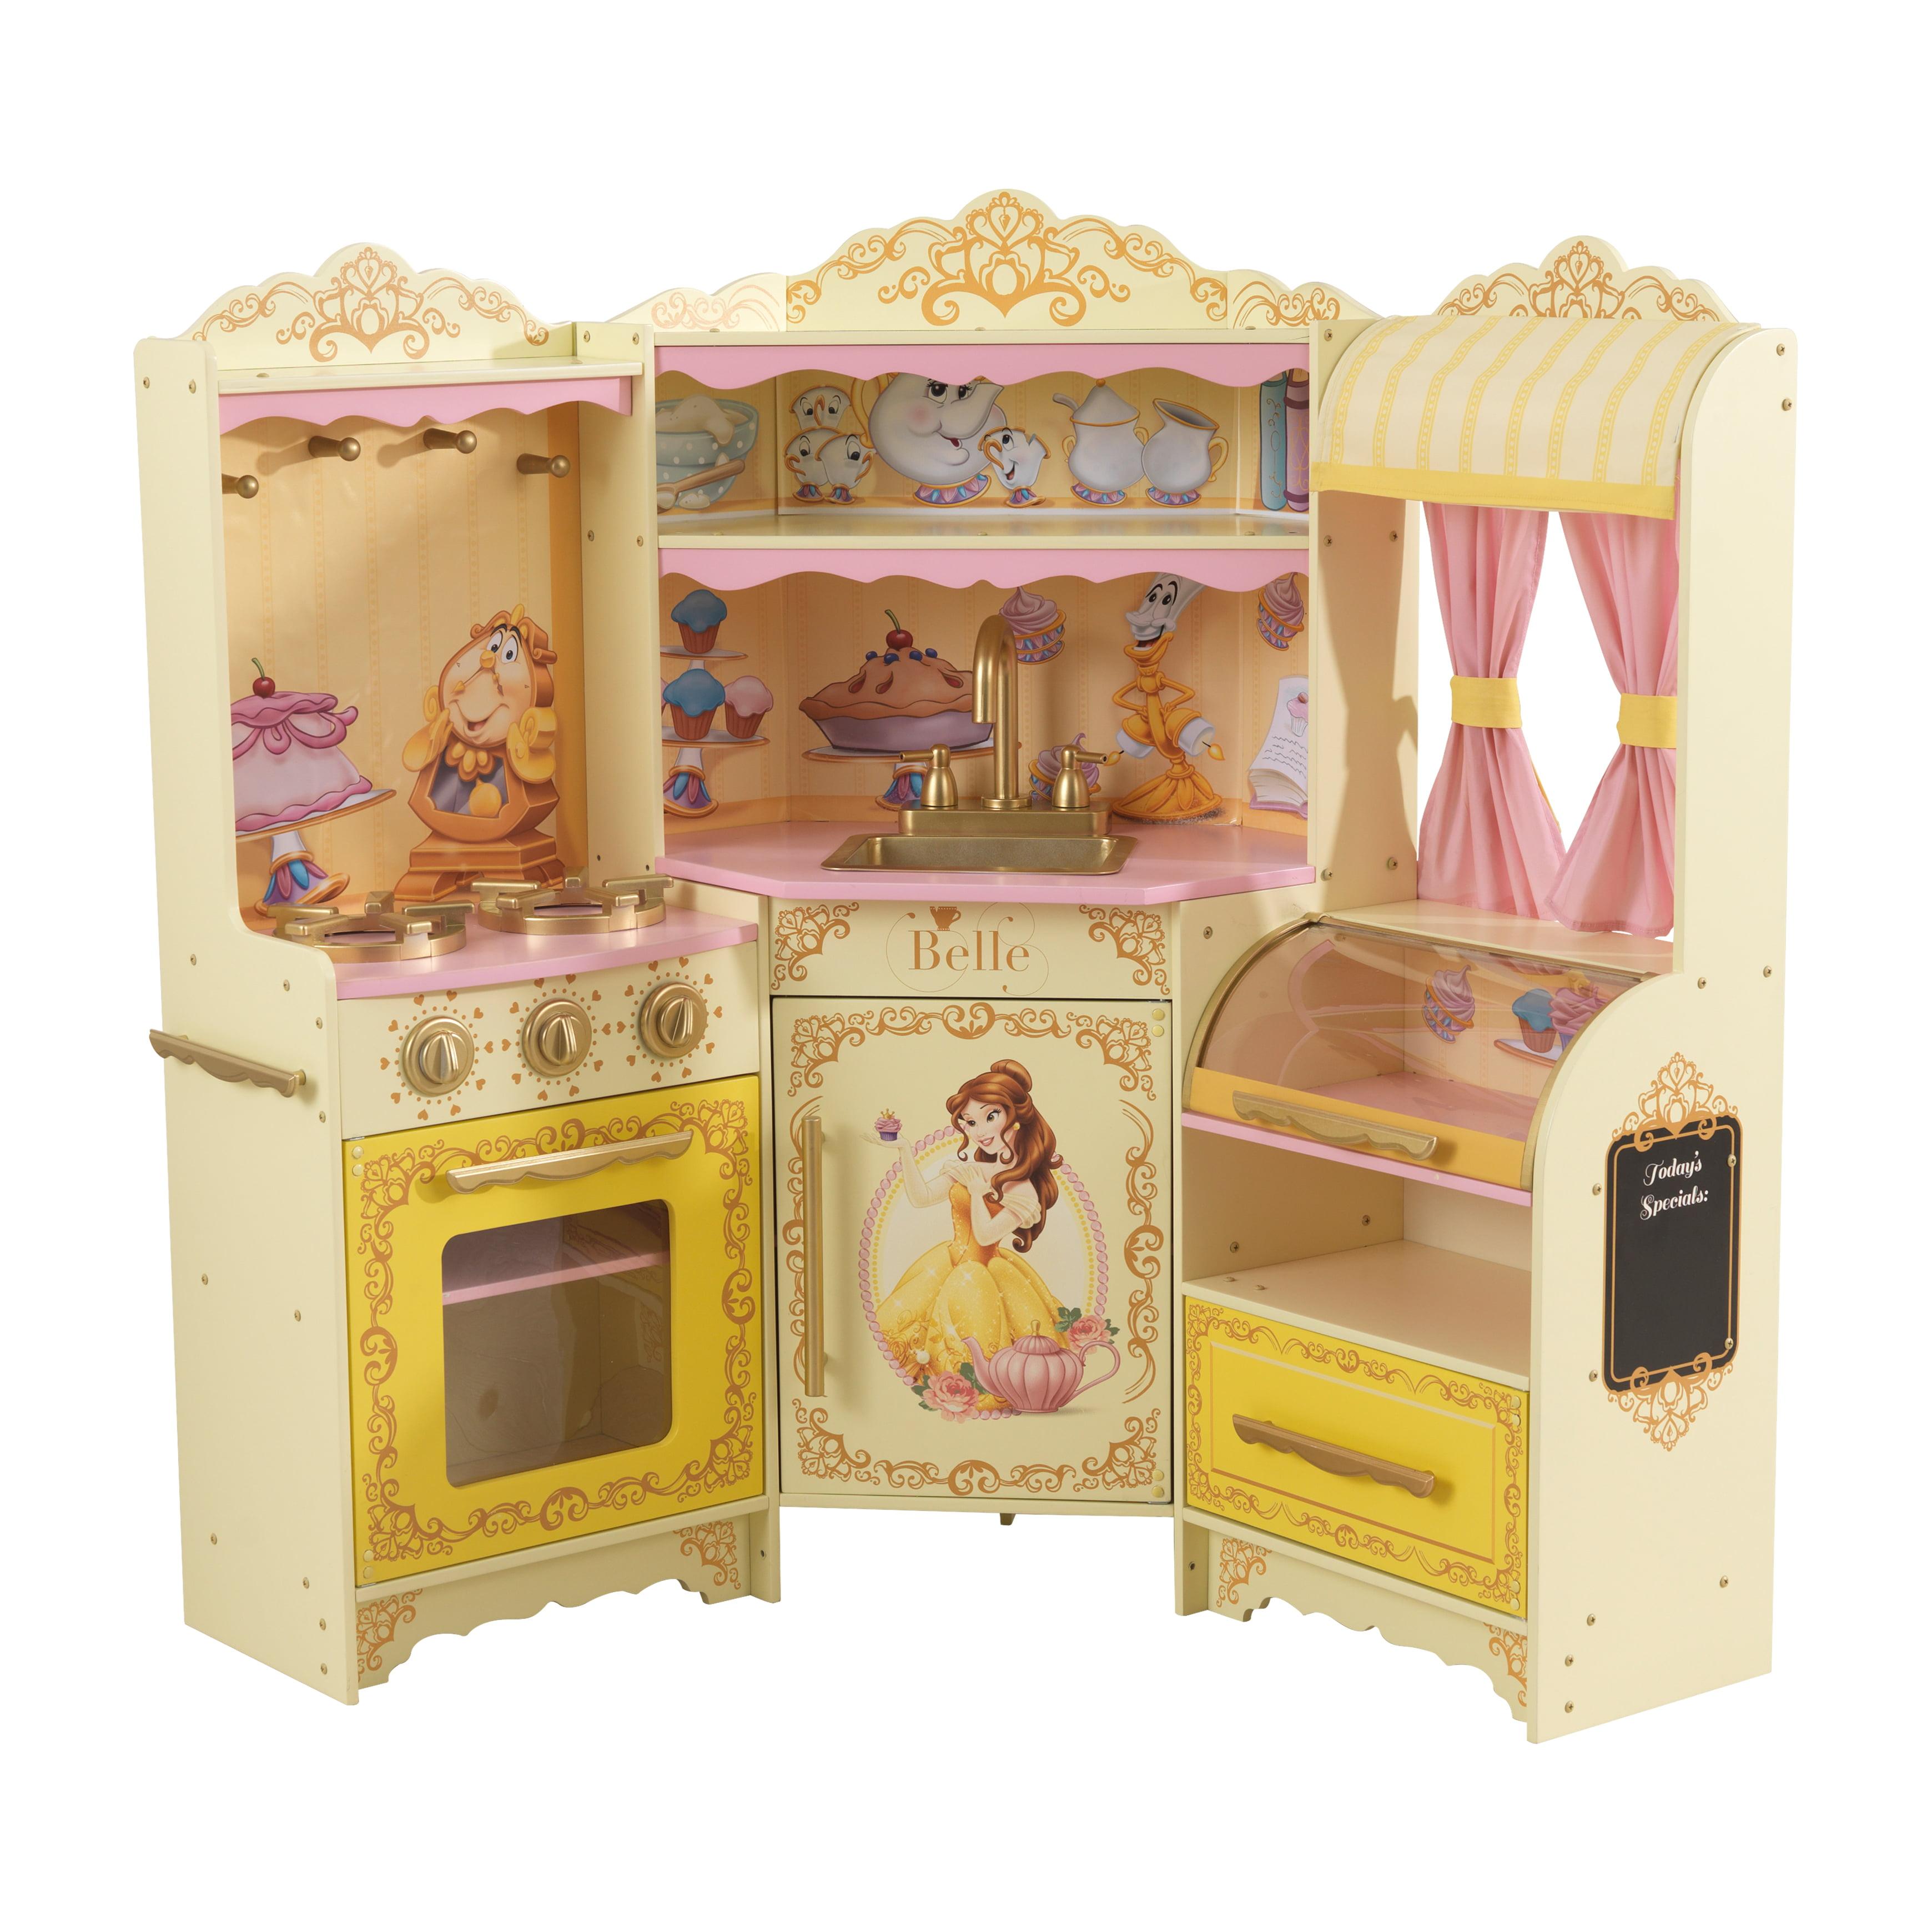 Disney Princess Belle Pastry Kitchen By KidKraft by KidKraft, Inc.